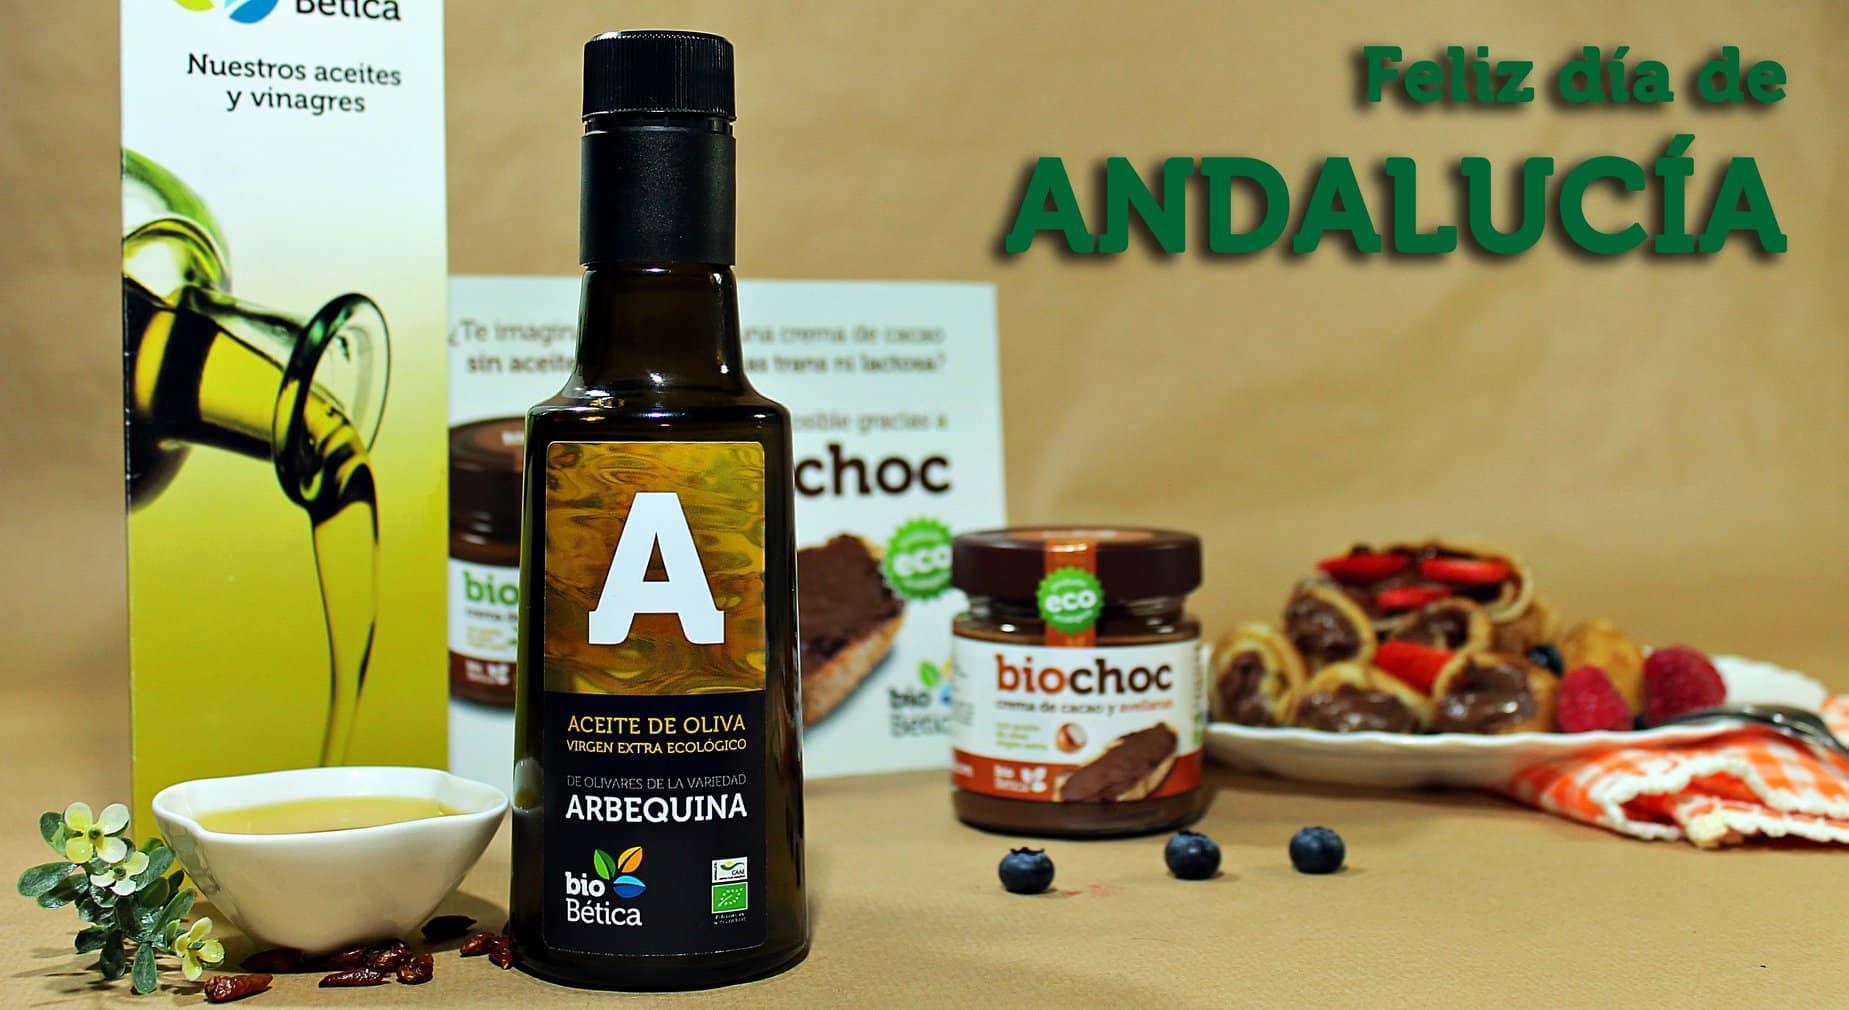 Aceite de oliva virgen extra ecológico Arbequina biobética